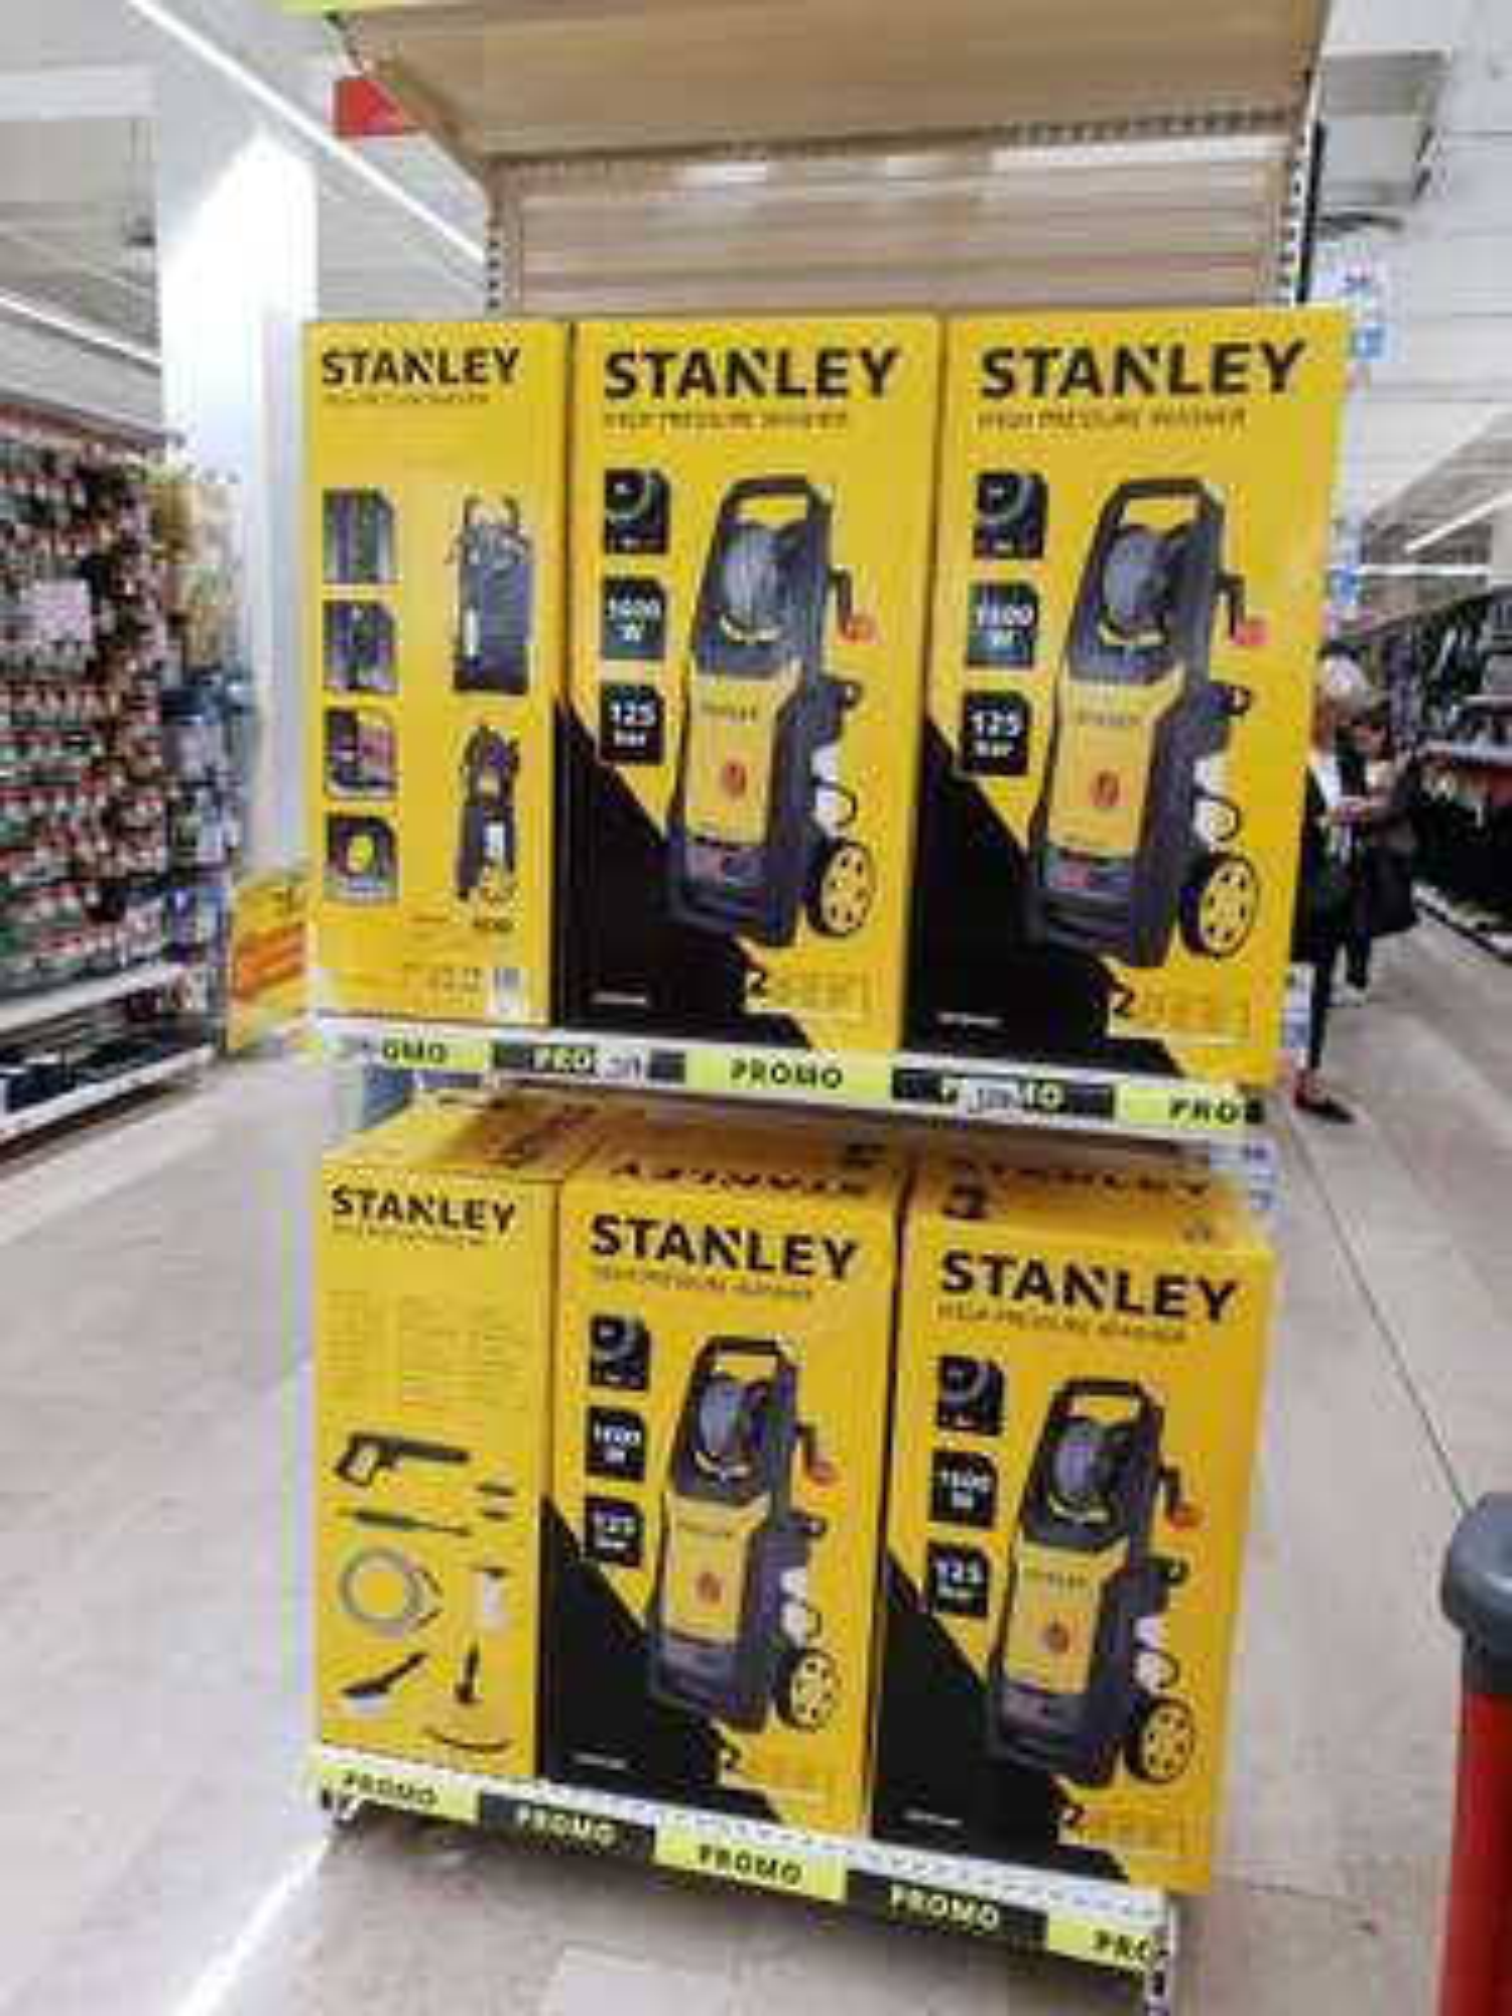 Nettoyeur haute-pression Stanley SXPW16E (125 bars, 1600 W, 240l/h) - Auchan